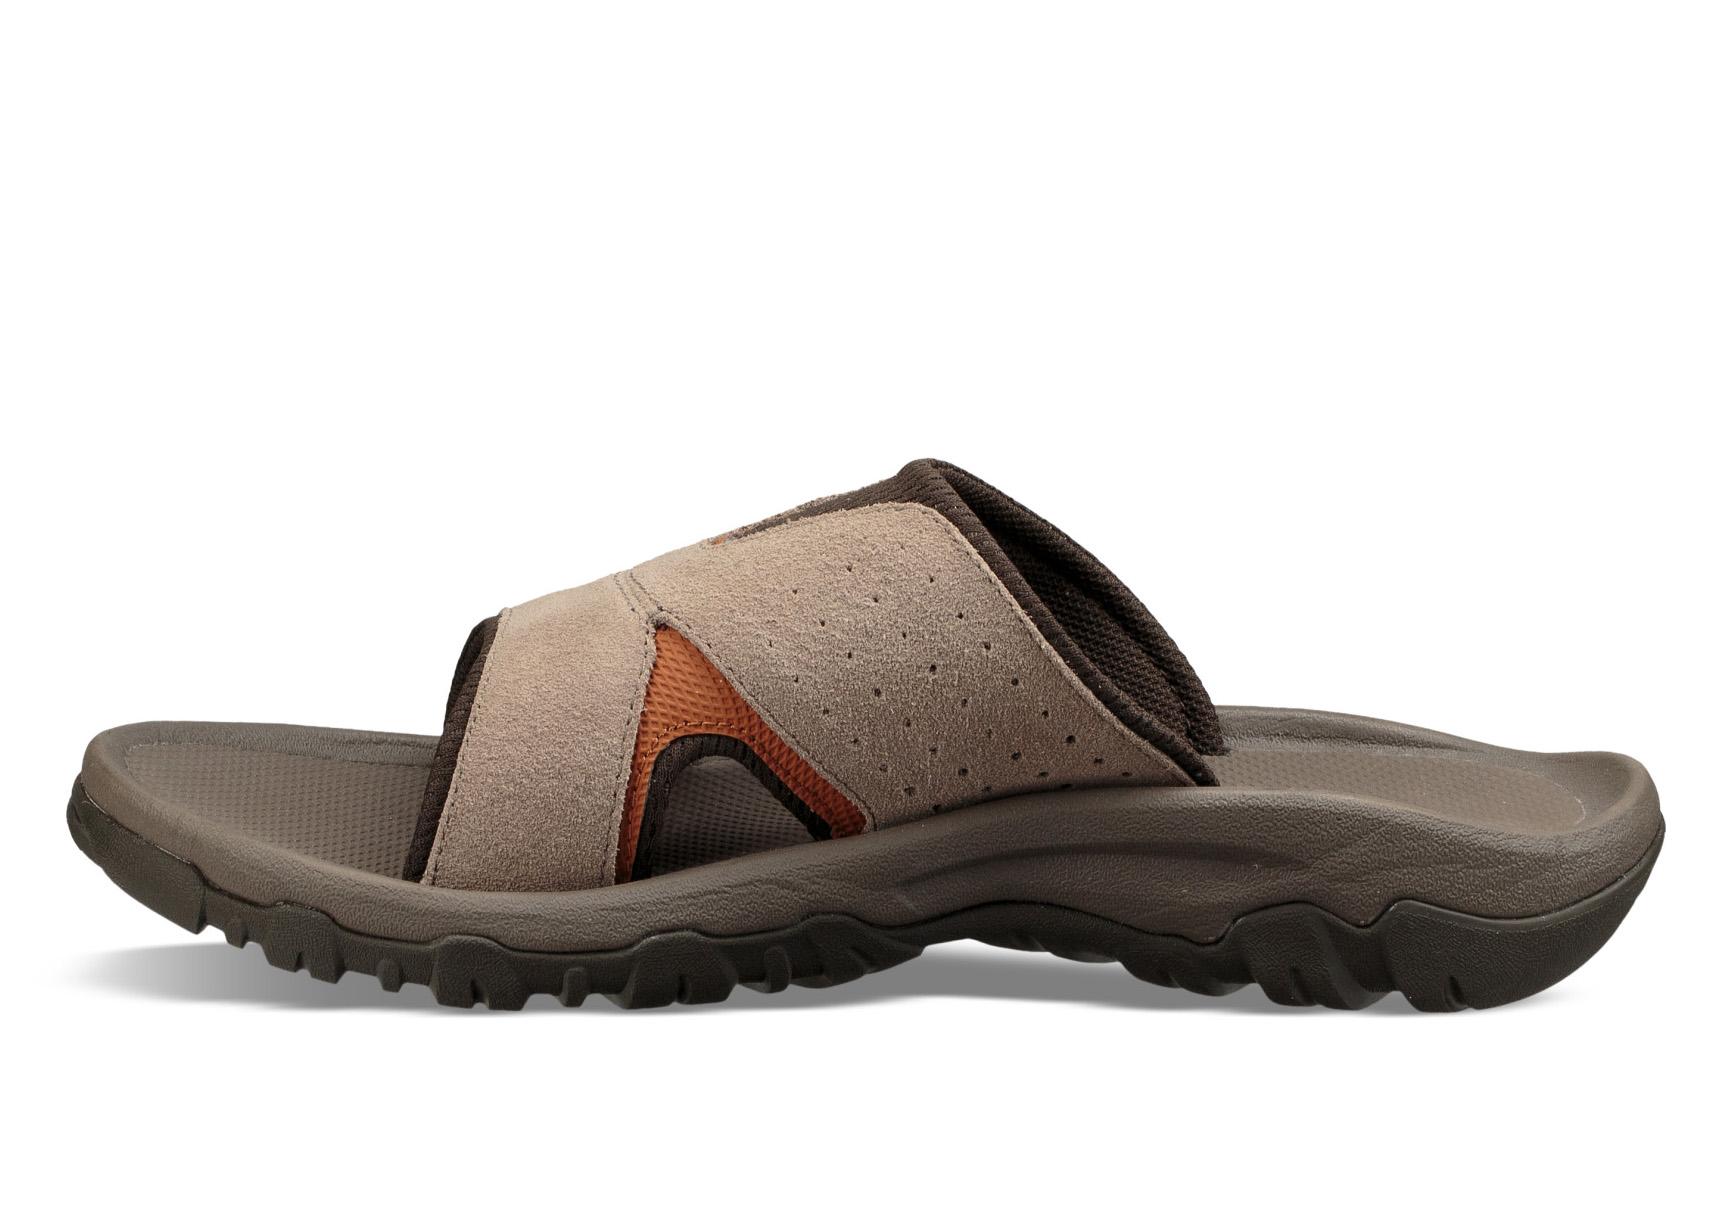 13d0030eedbe Mens Teva Katavi 2 Slide Sandal Walnut in Brown